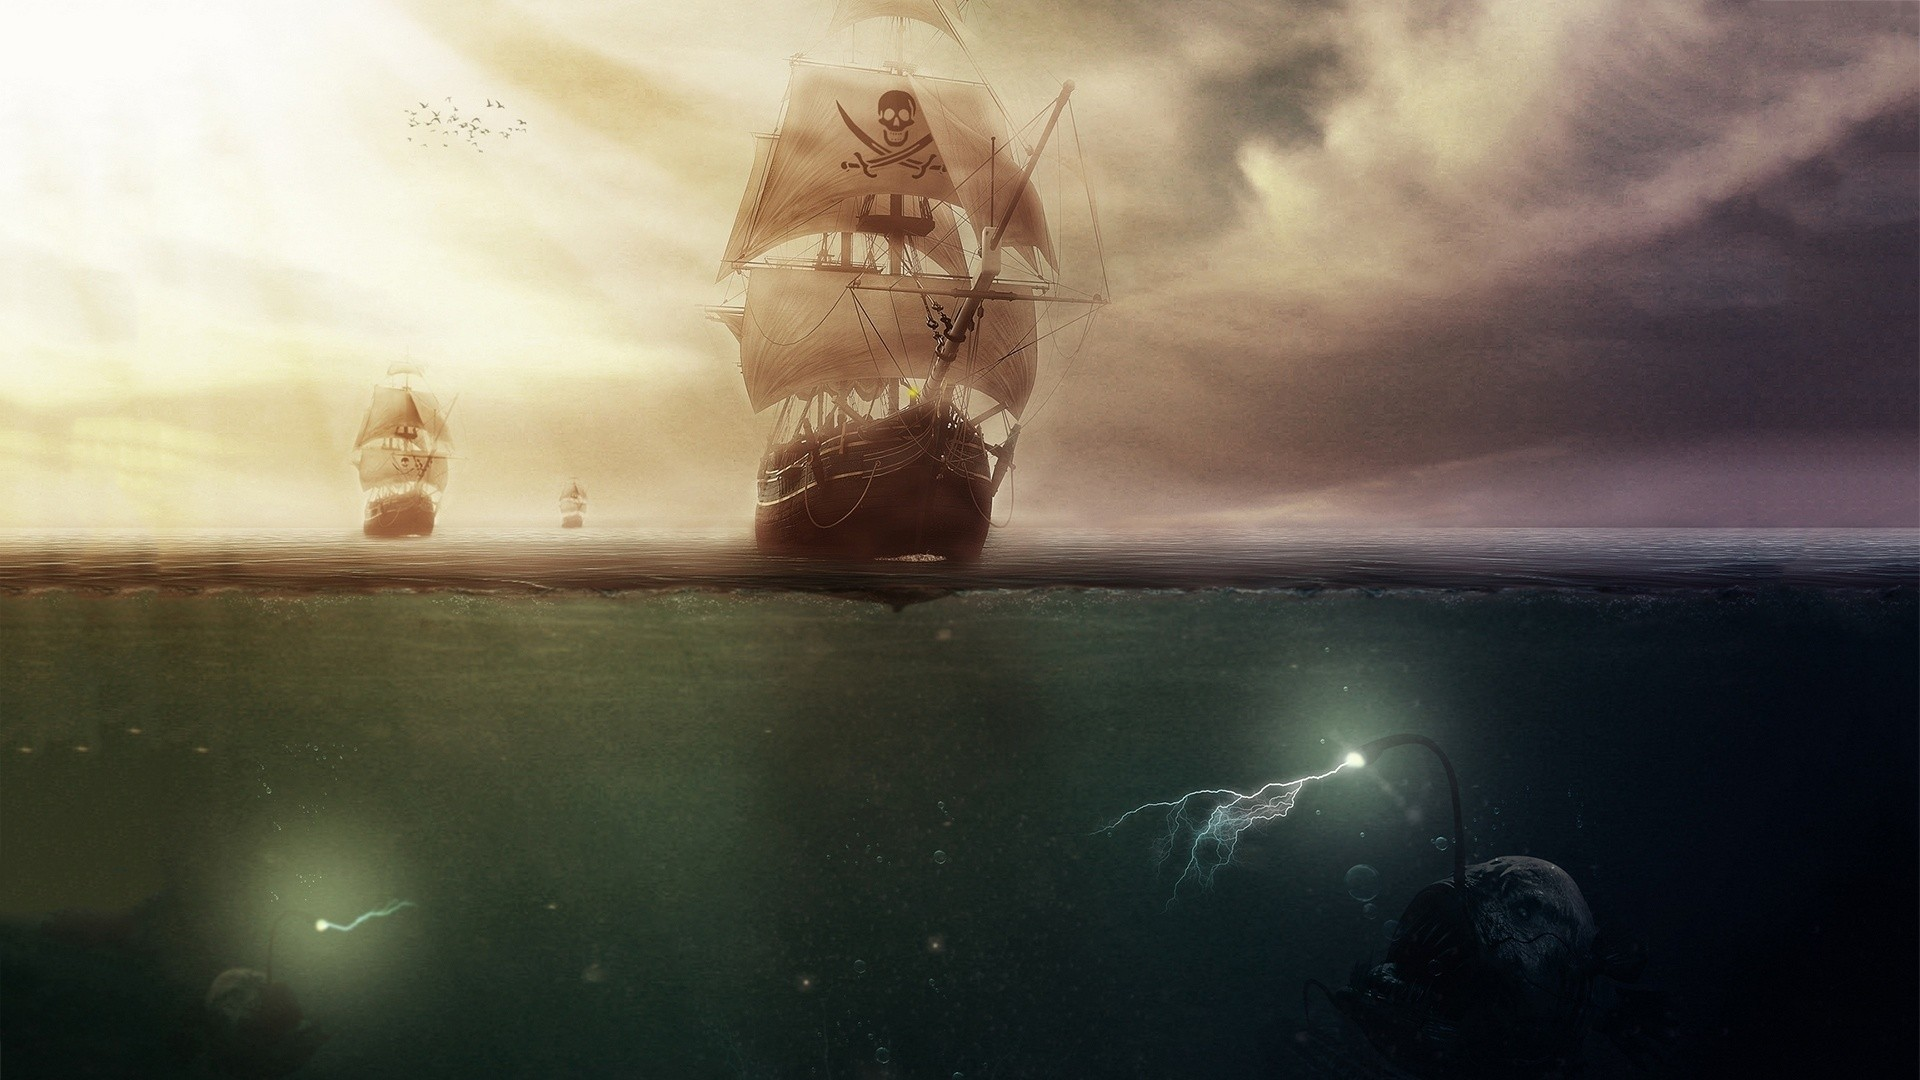 General 1920x1080 artwork sailing ship sea clouds pirates Anglerfish lightning underwater bubbles fantasy art sun rays sea monsters horizon skull